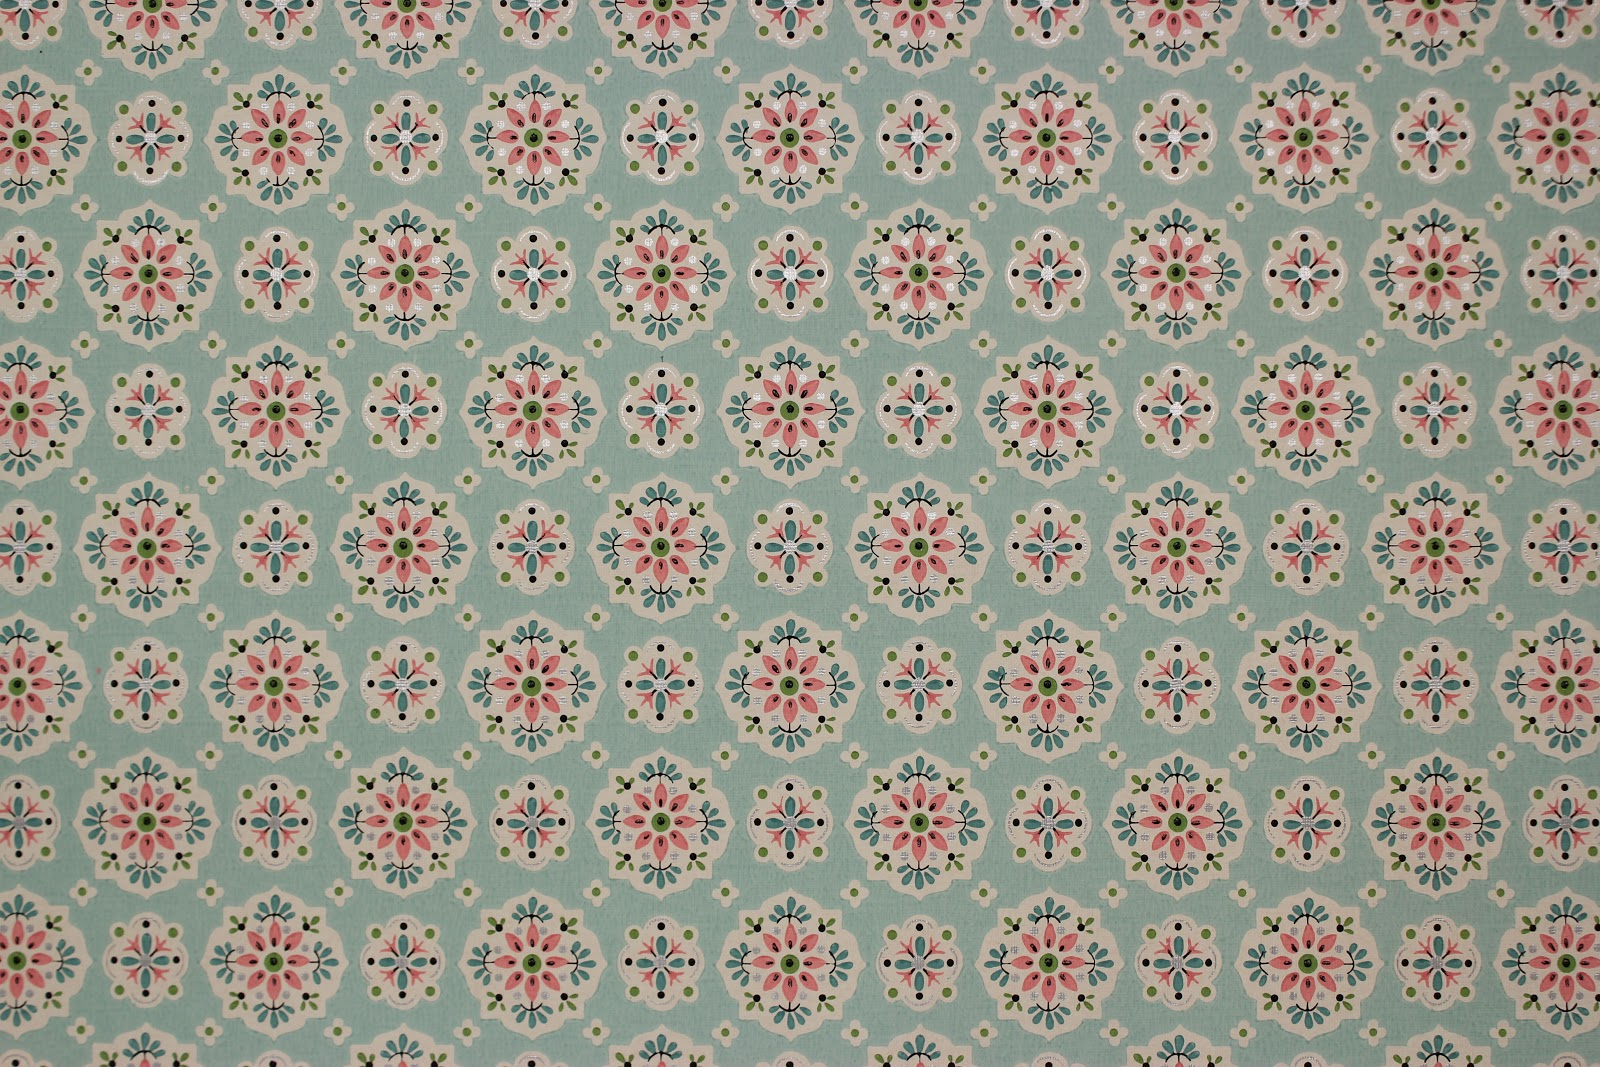 wwwistockresellercomwhite vintage wallpaper stock photo 18593516 1600x1067